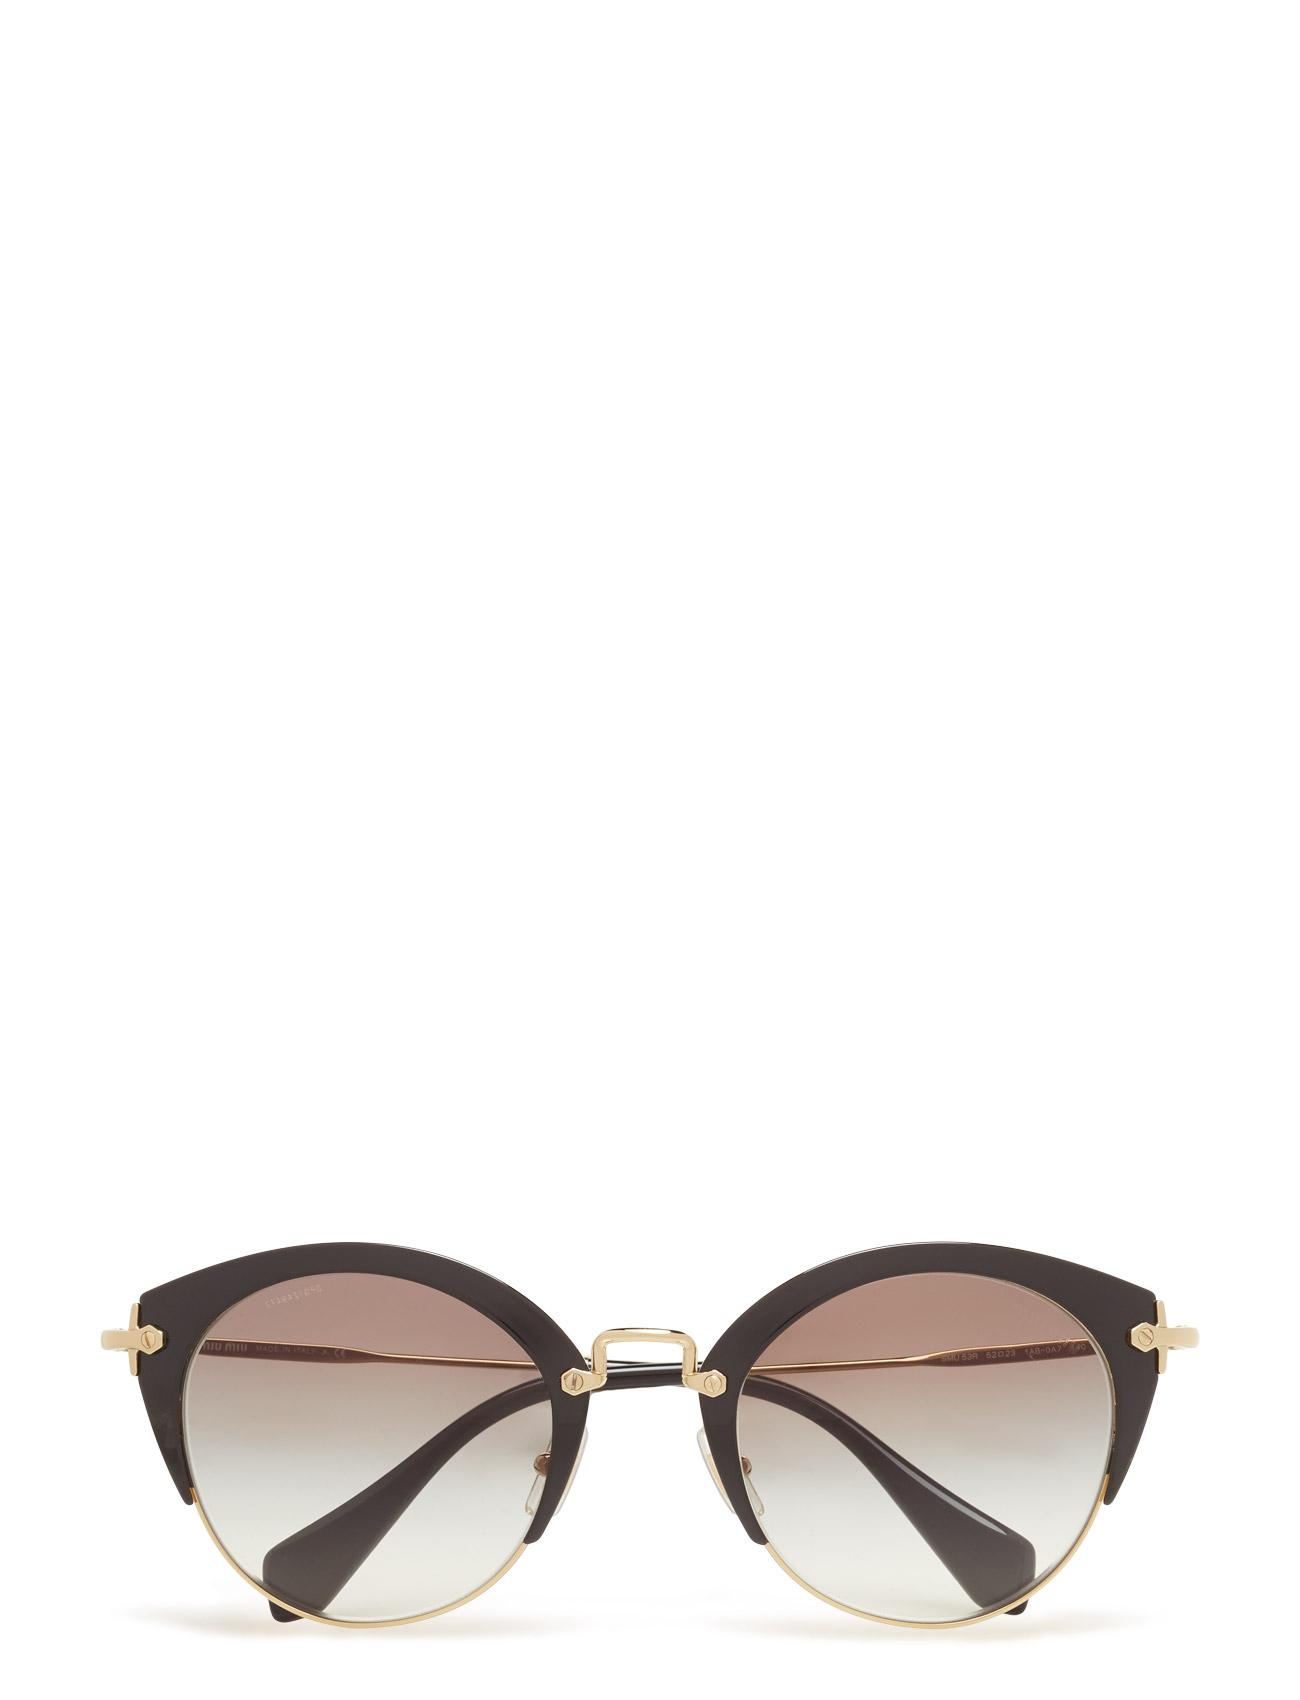 Cat Eye Miu Miu Sunglasses Solbriller til Damer i